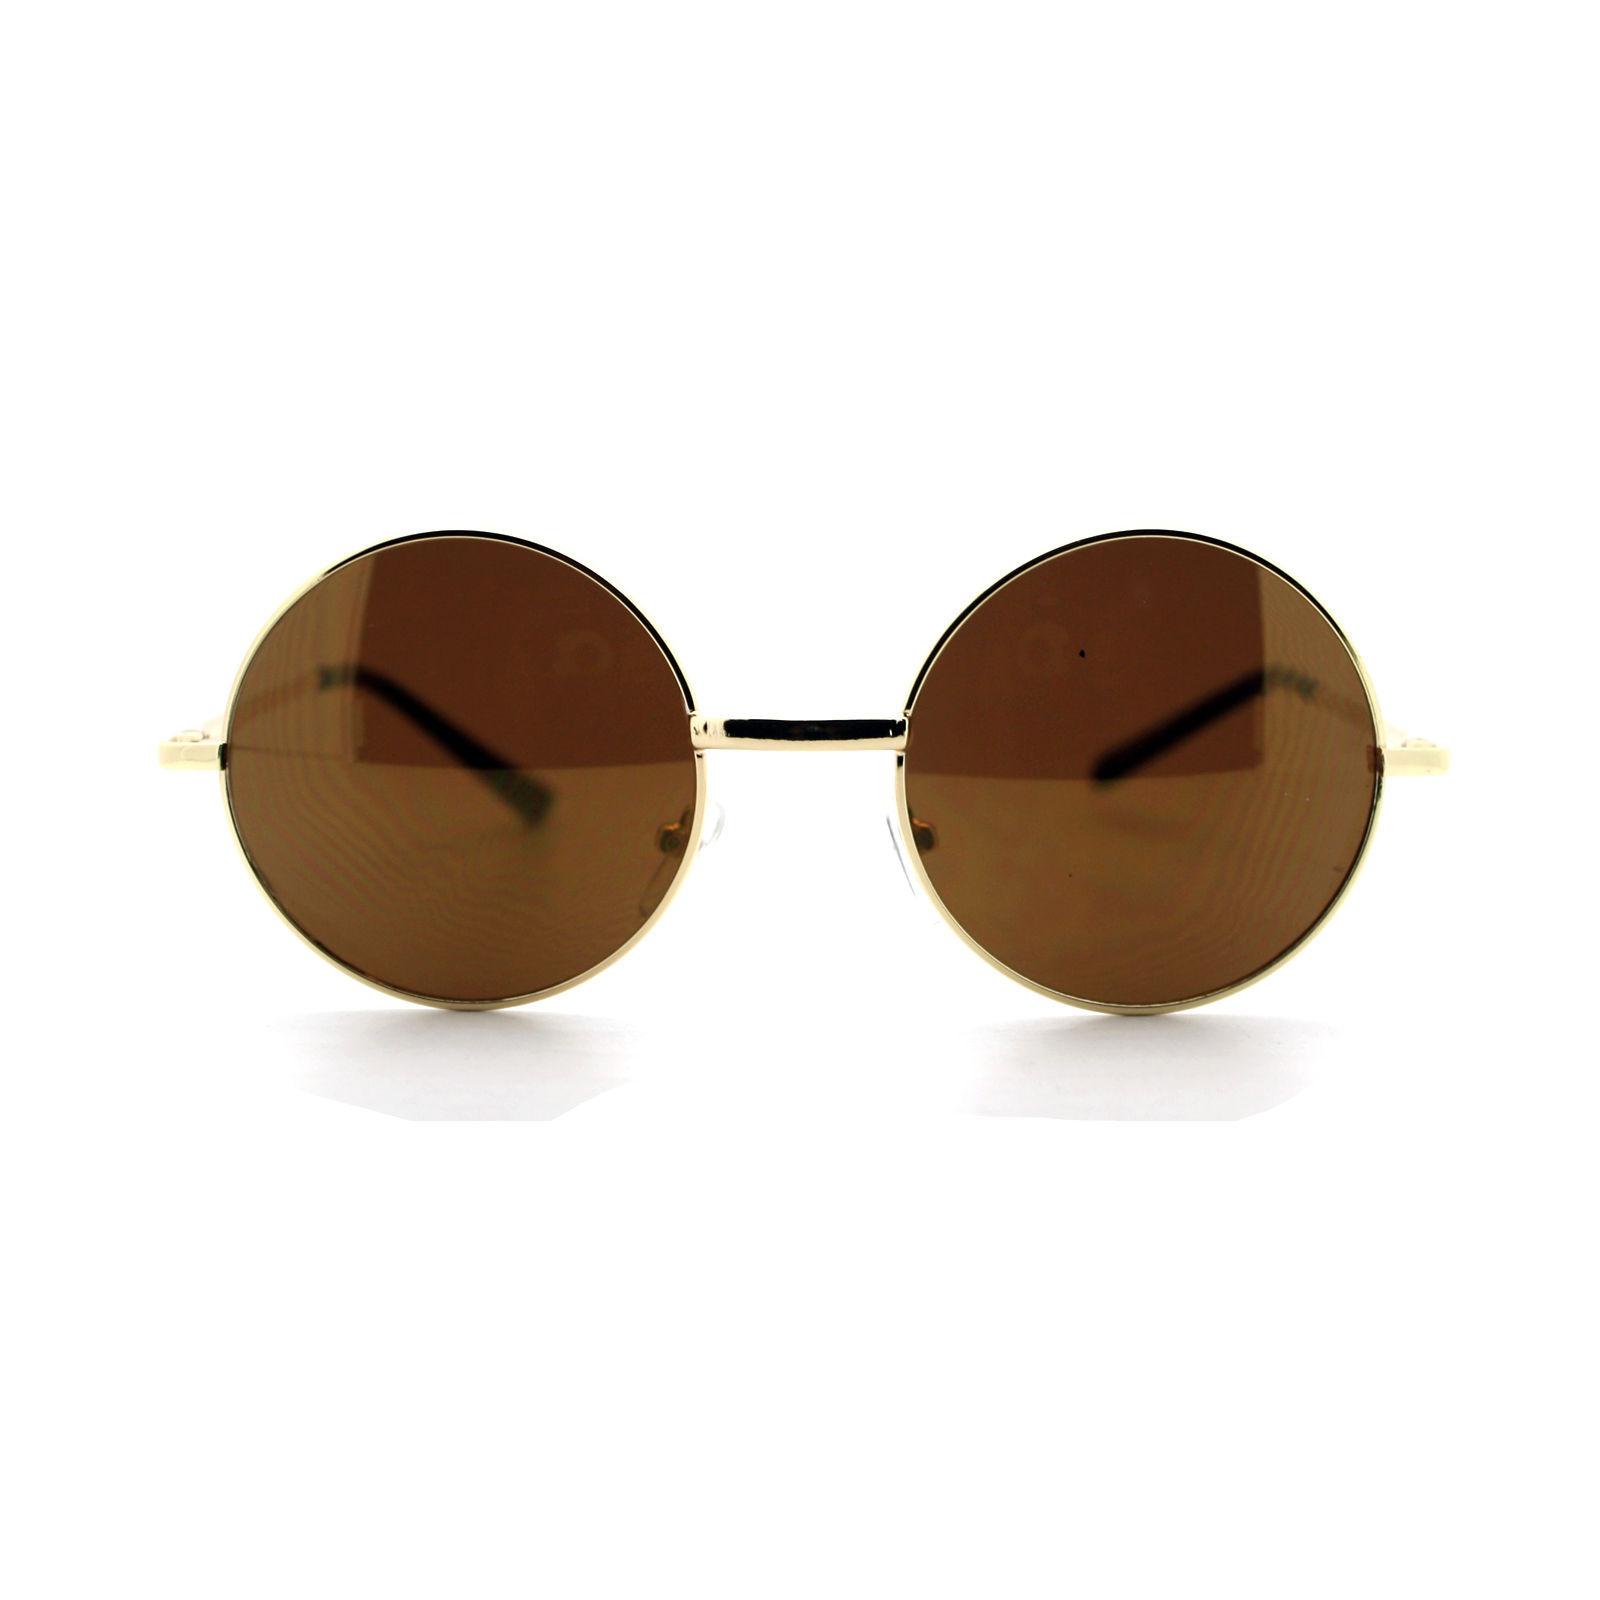 Round Circle Frame Sunglasses Thin Metal Spring Hinge Mirror Lens